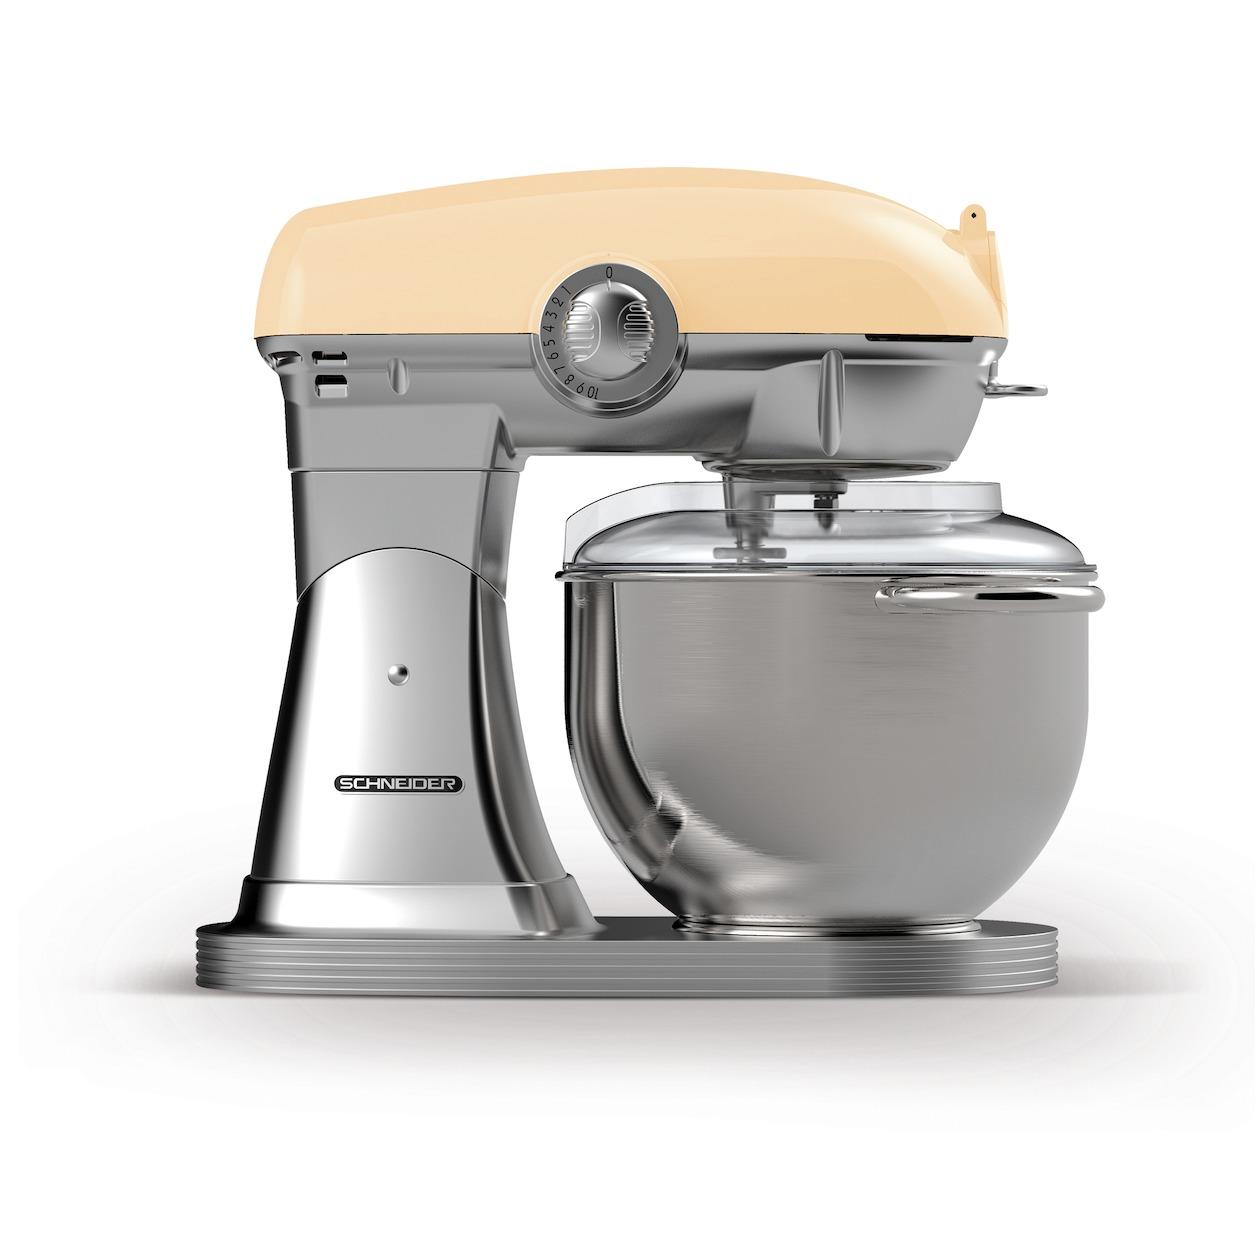 Schneider keukenmachine SCFP57 CR creme - Prijsvergelijk